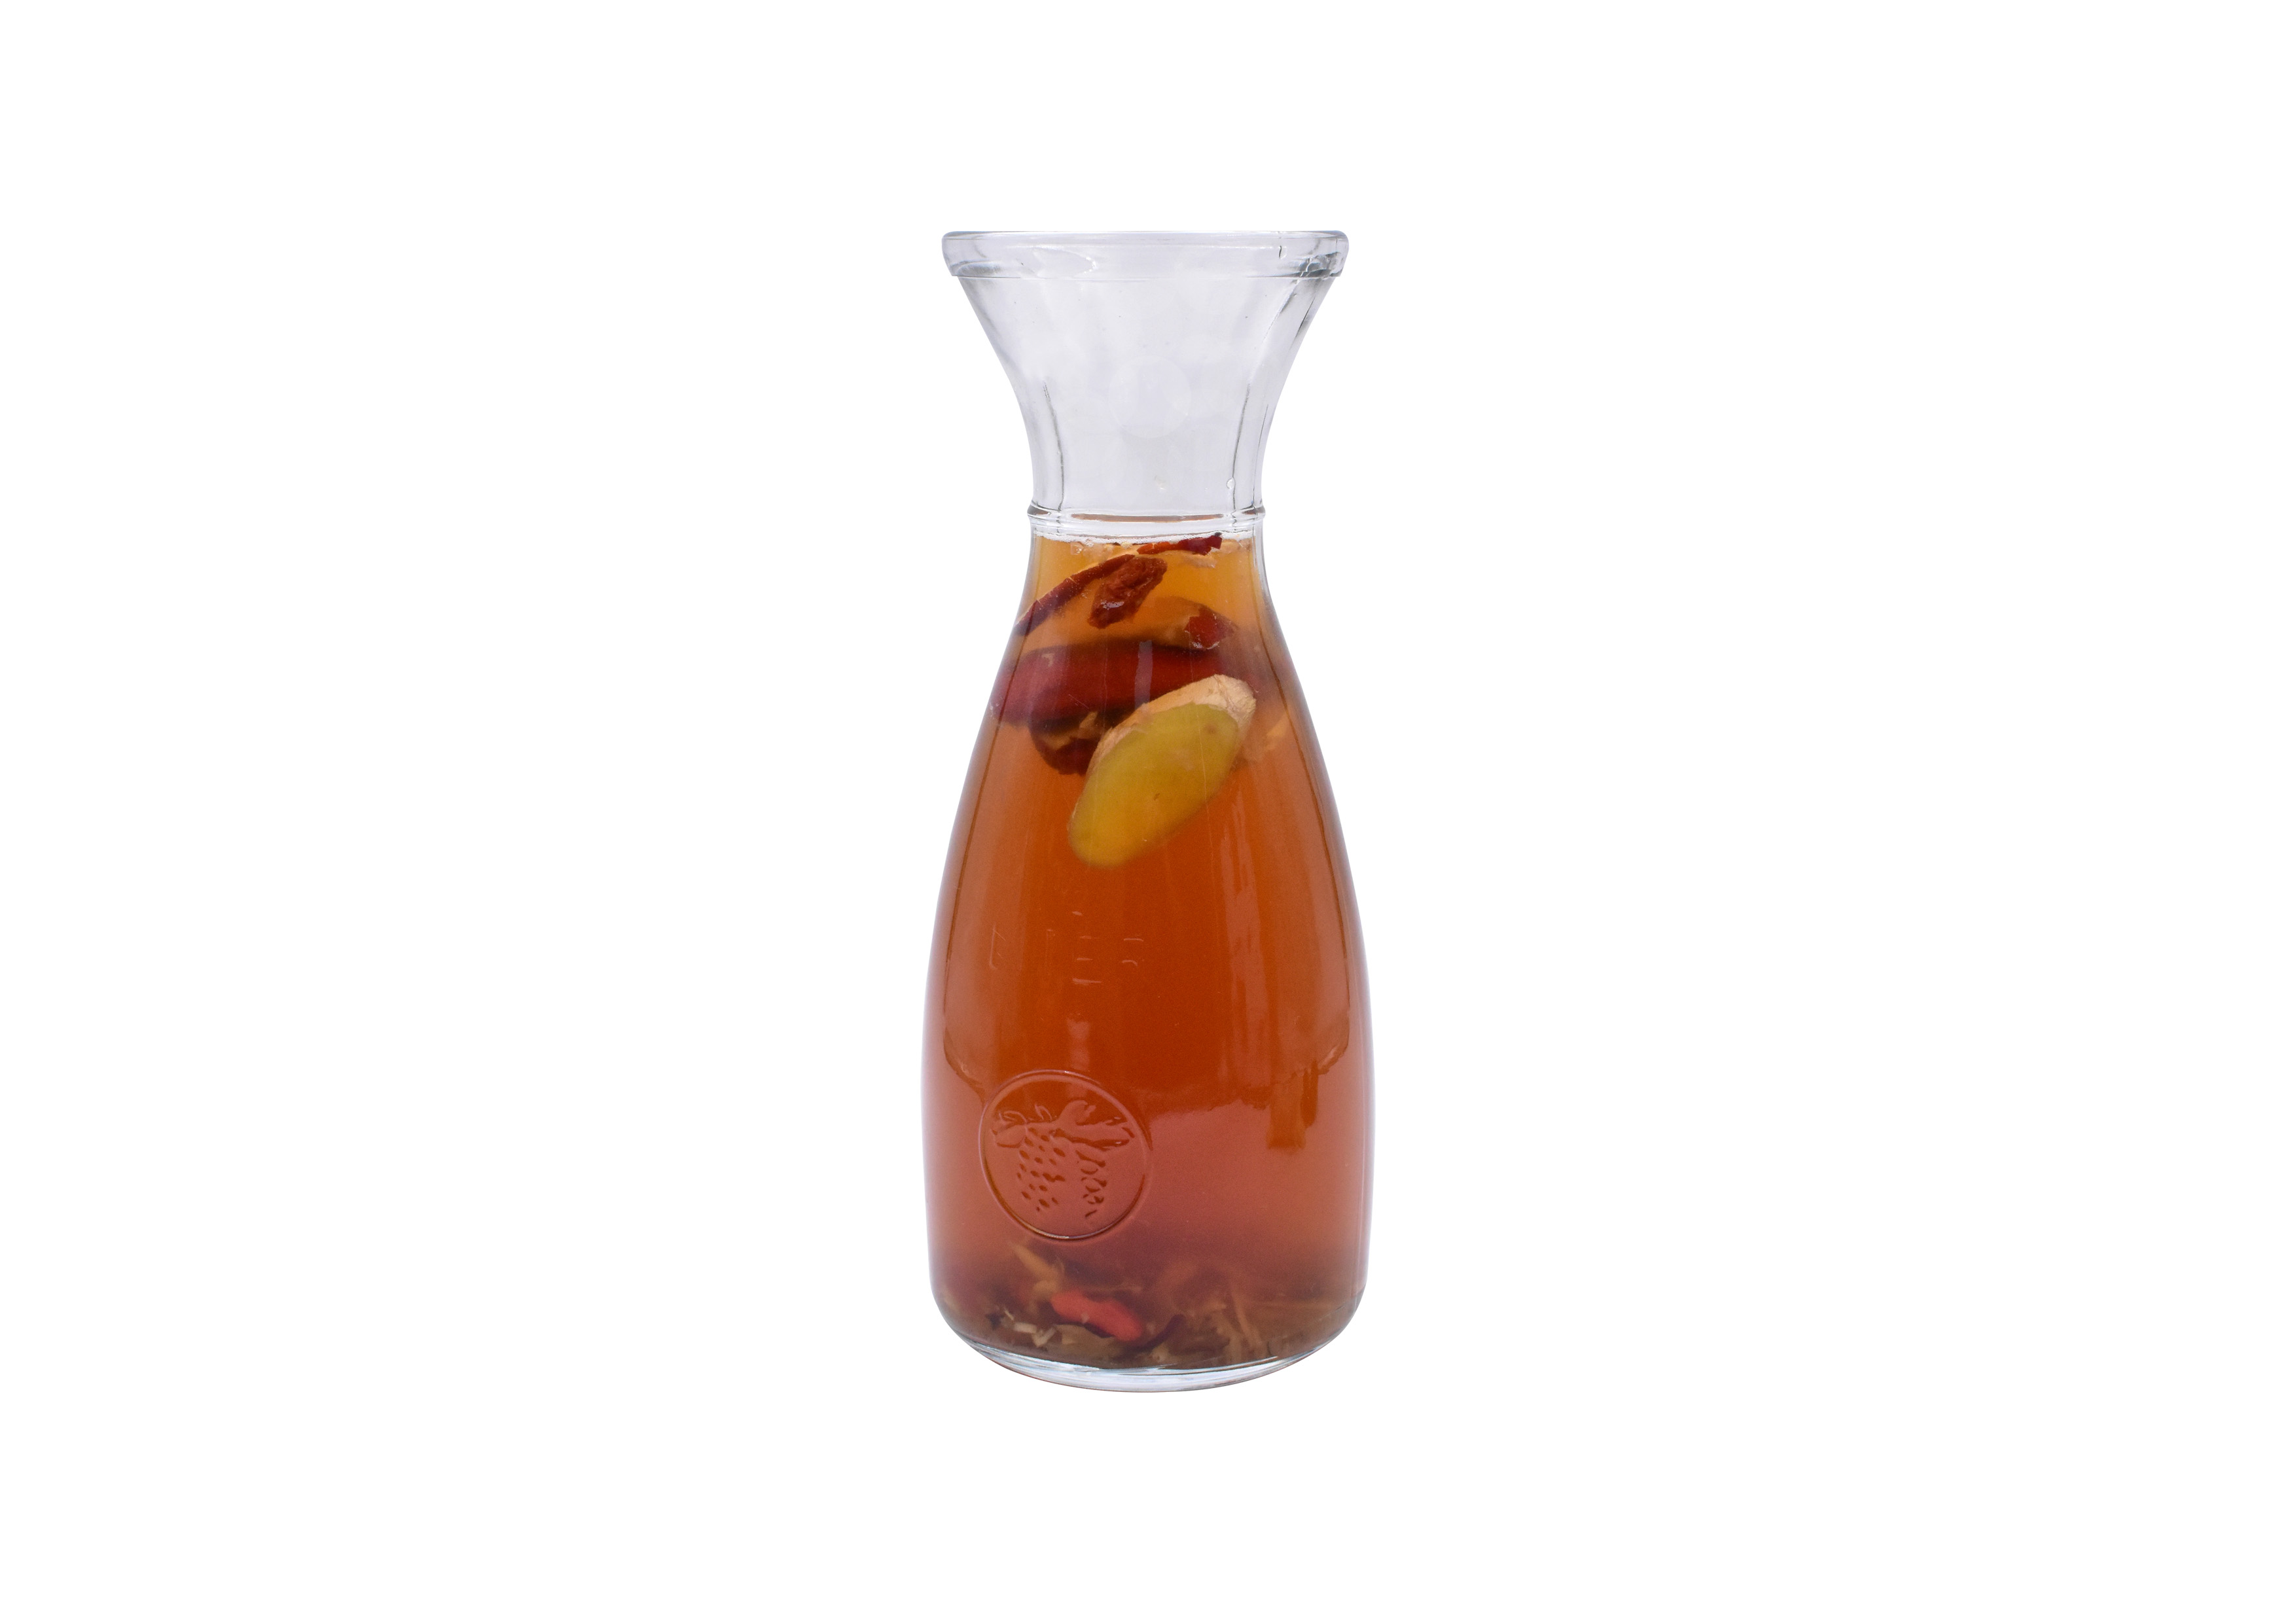 养生茶(Health tea)